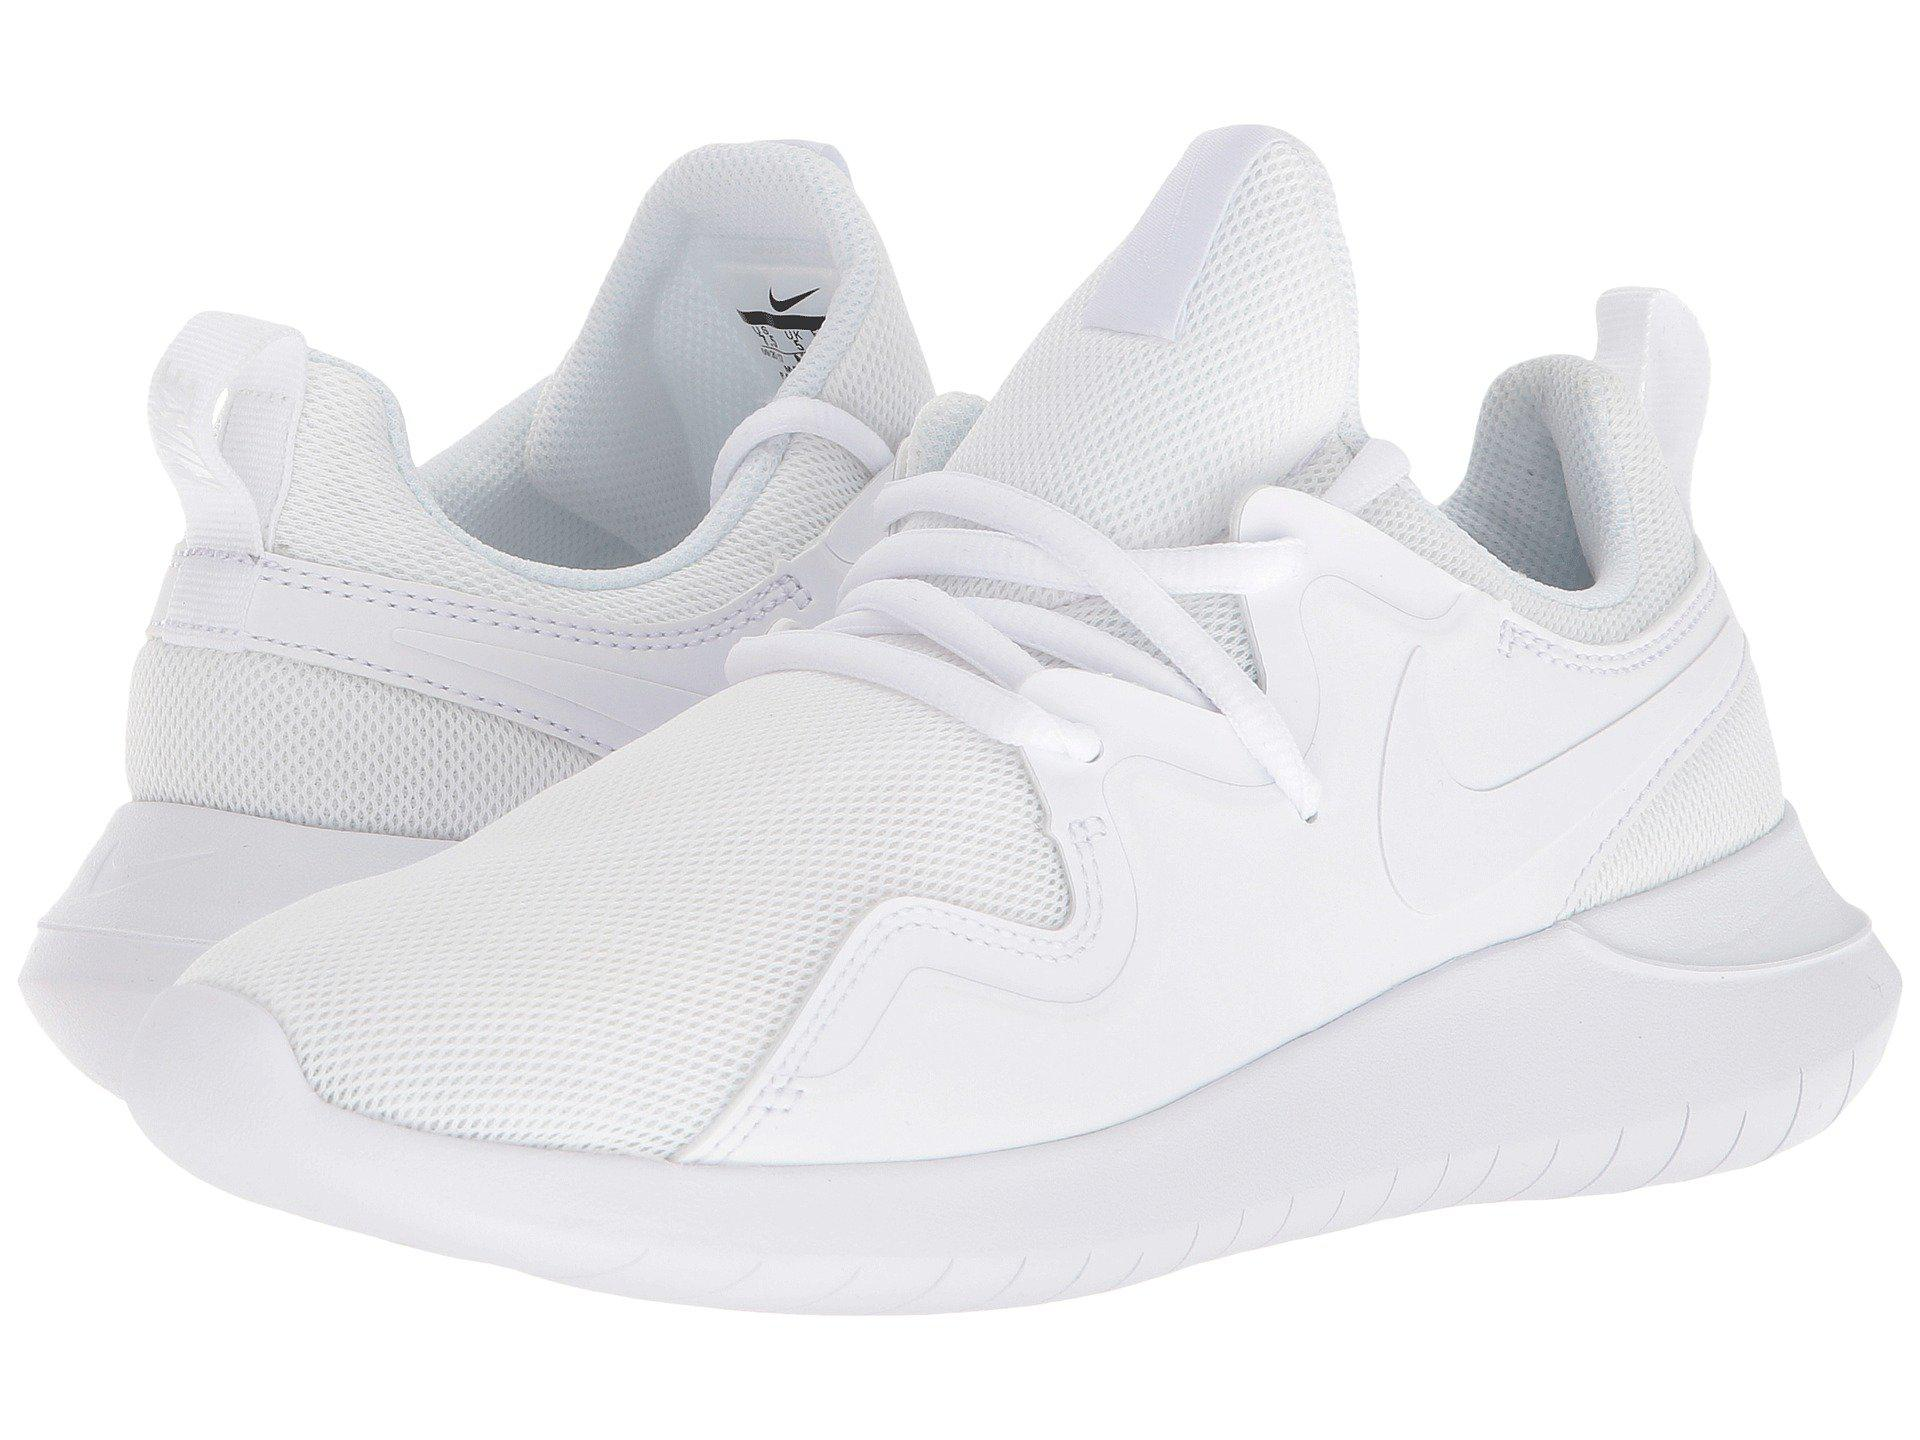 87ac18f6b Lyst - Nike Tessen in White - Save 40%